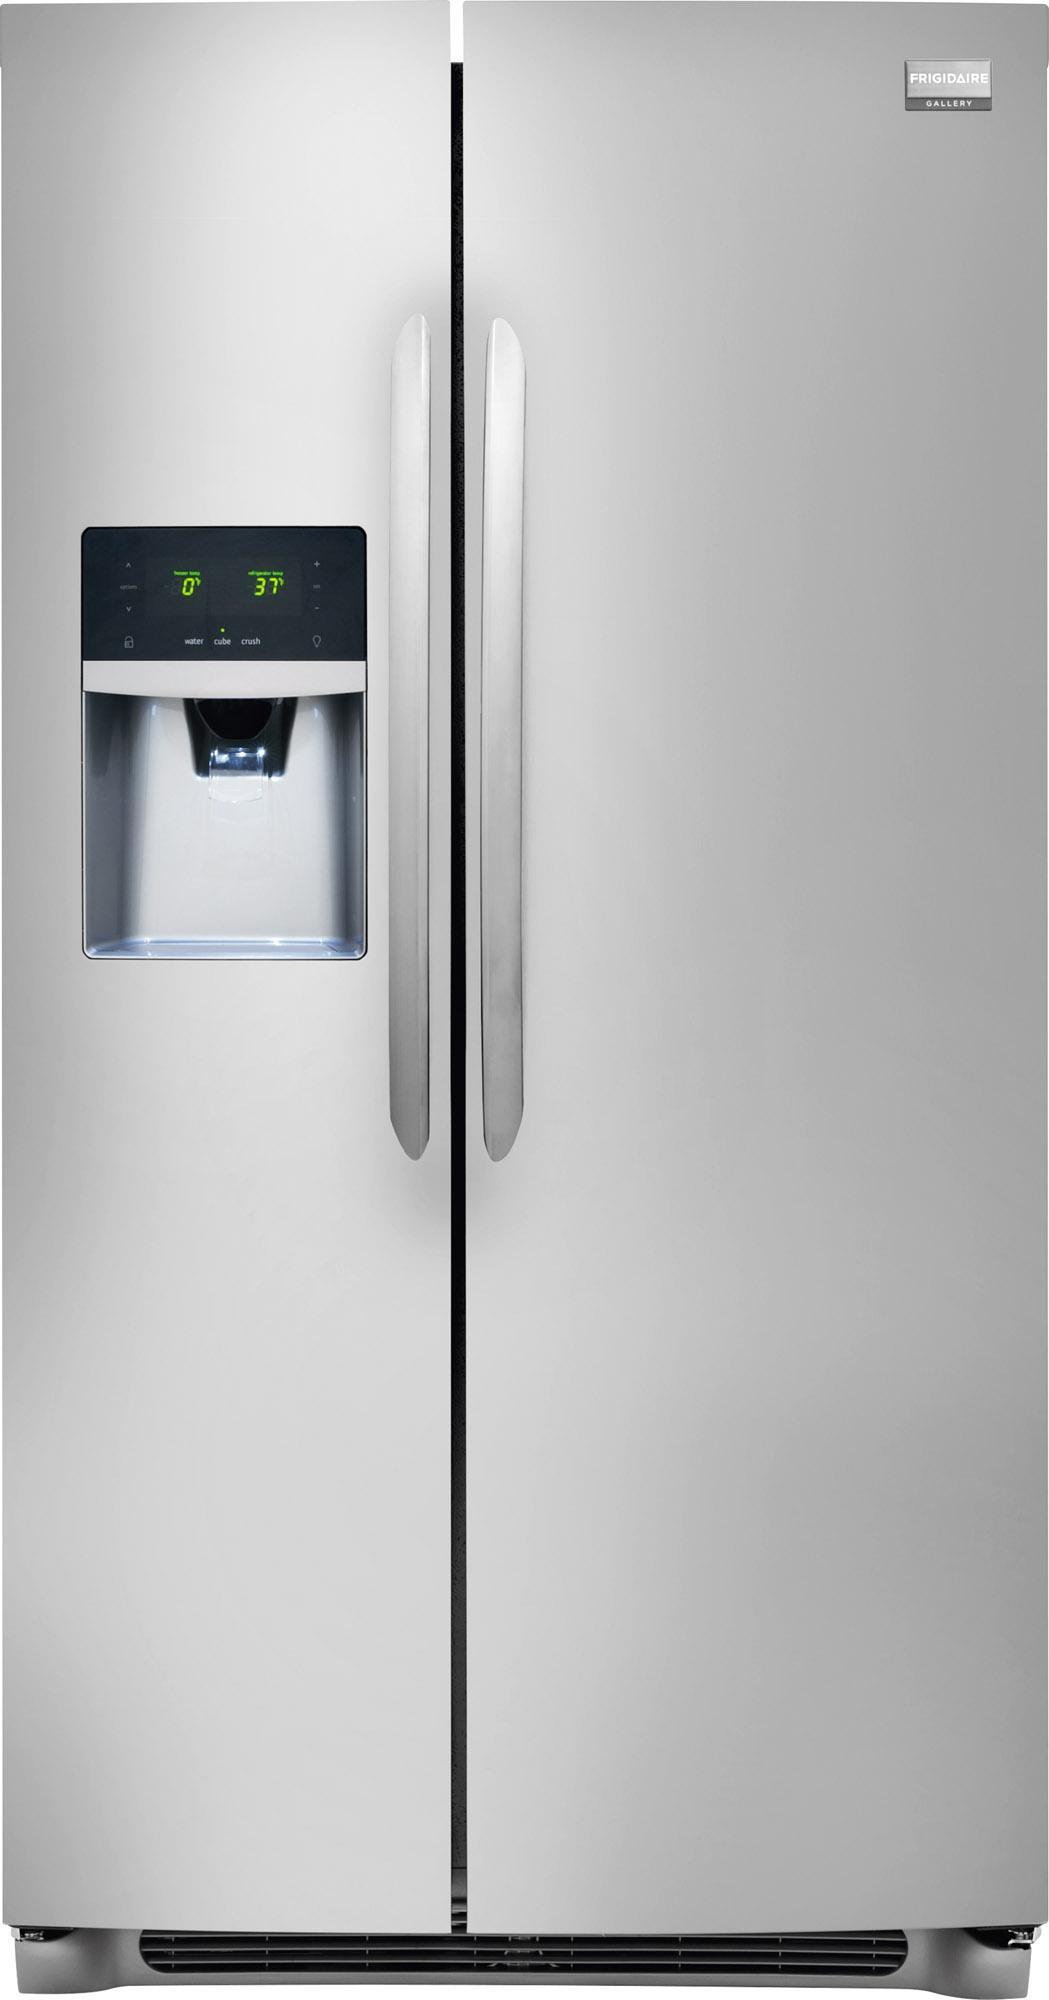 Frigidaire Refrigerator Freezer Door Bin Side by Side Refrigerators Part New